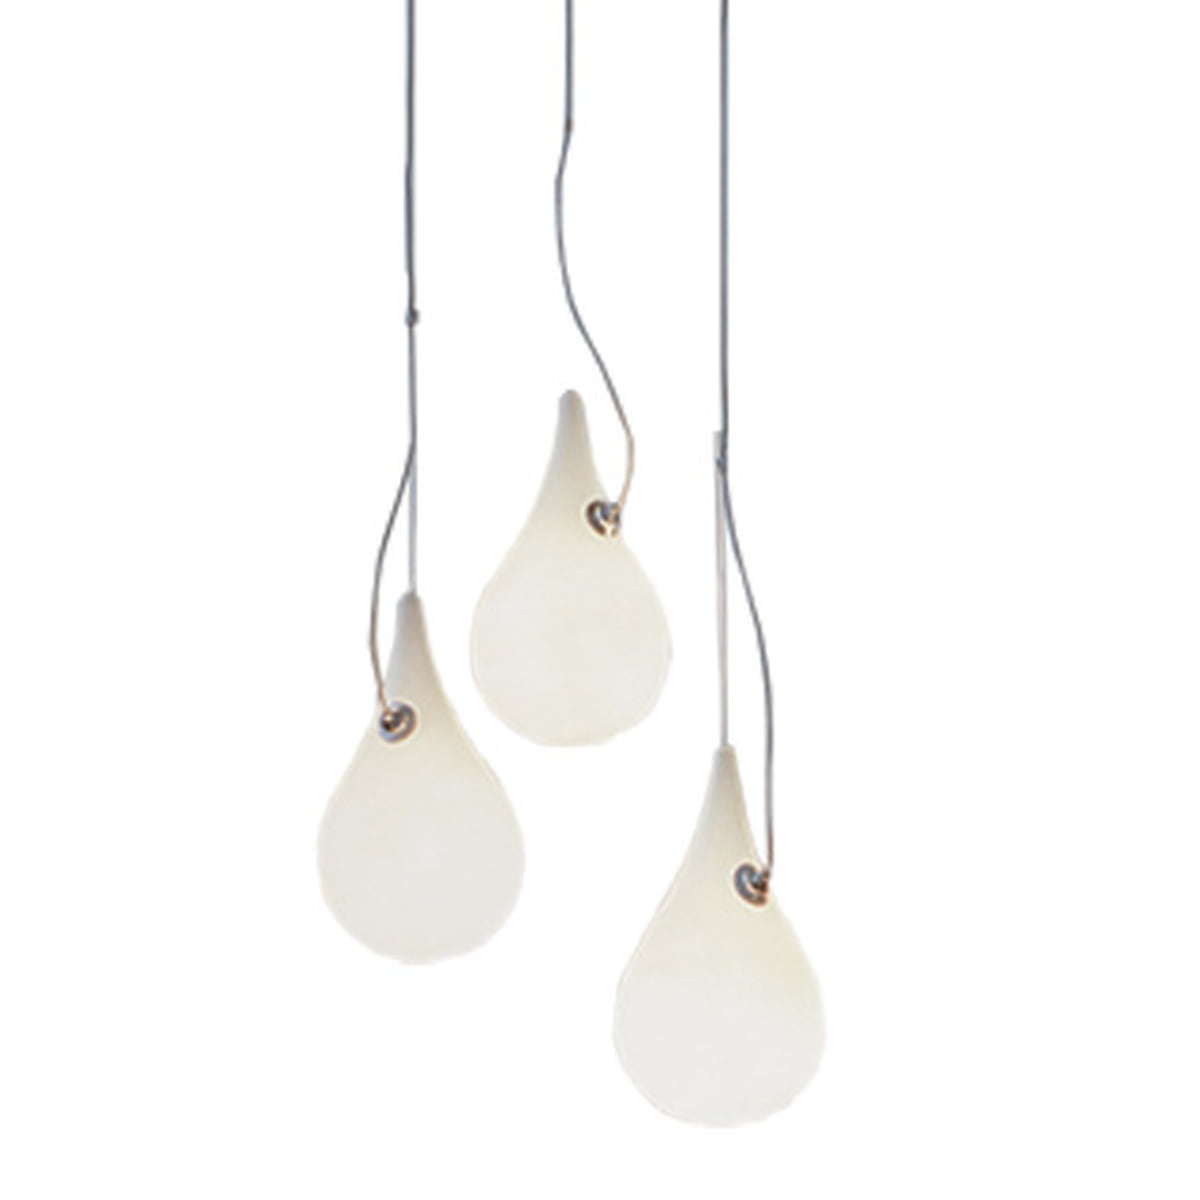 Drop_2xs 3er LED Pendelleuchte von Next Home